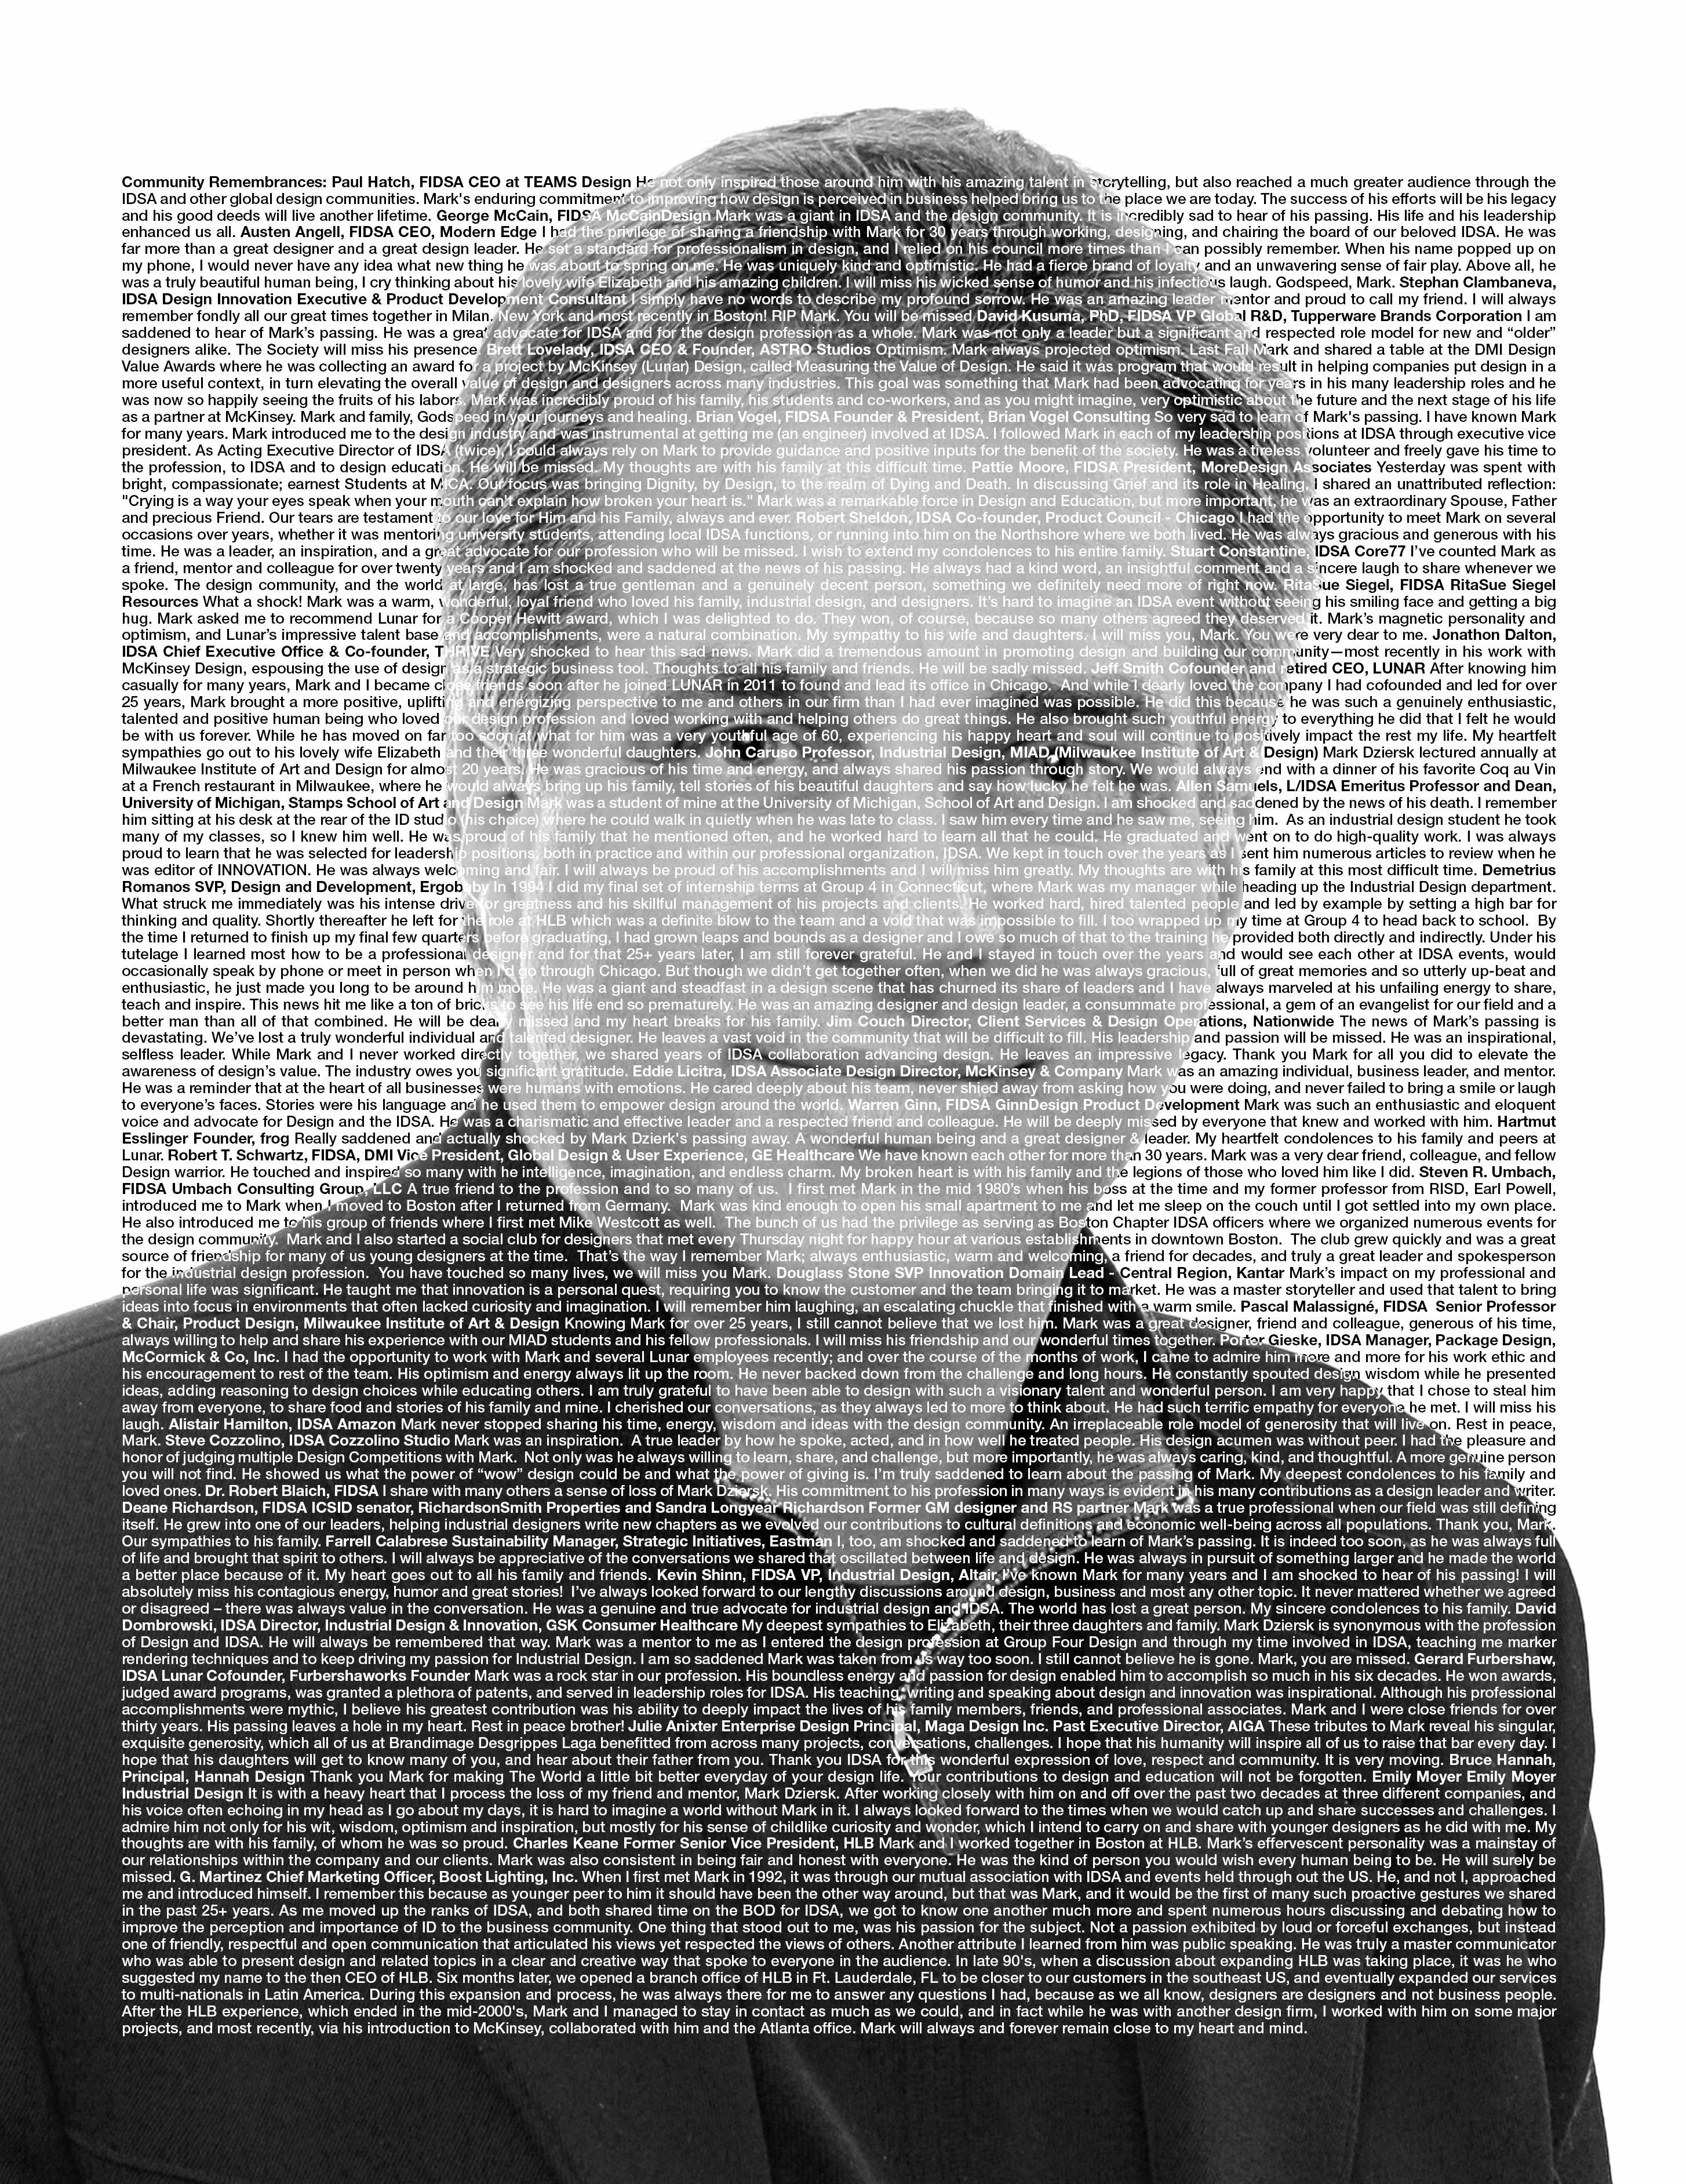 Page 10 of Tribute: Mark Dziersk, FIDSA